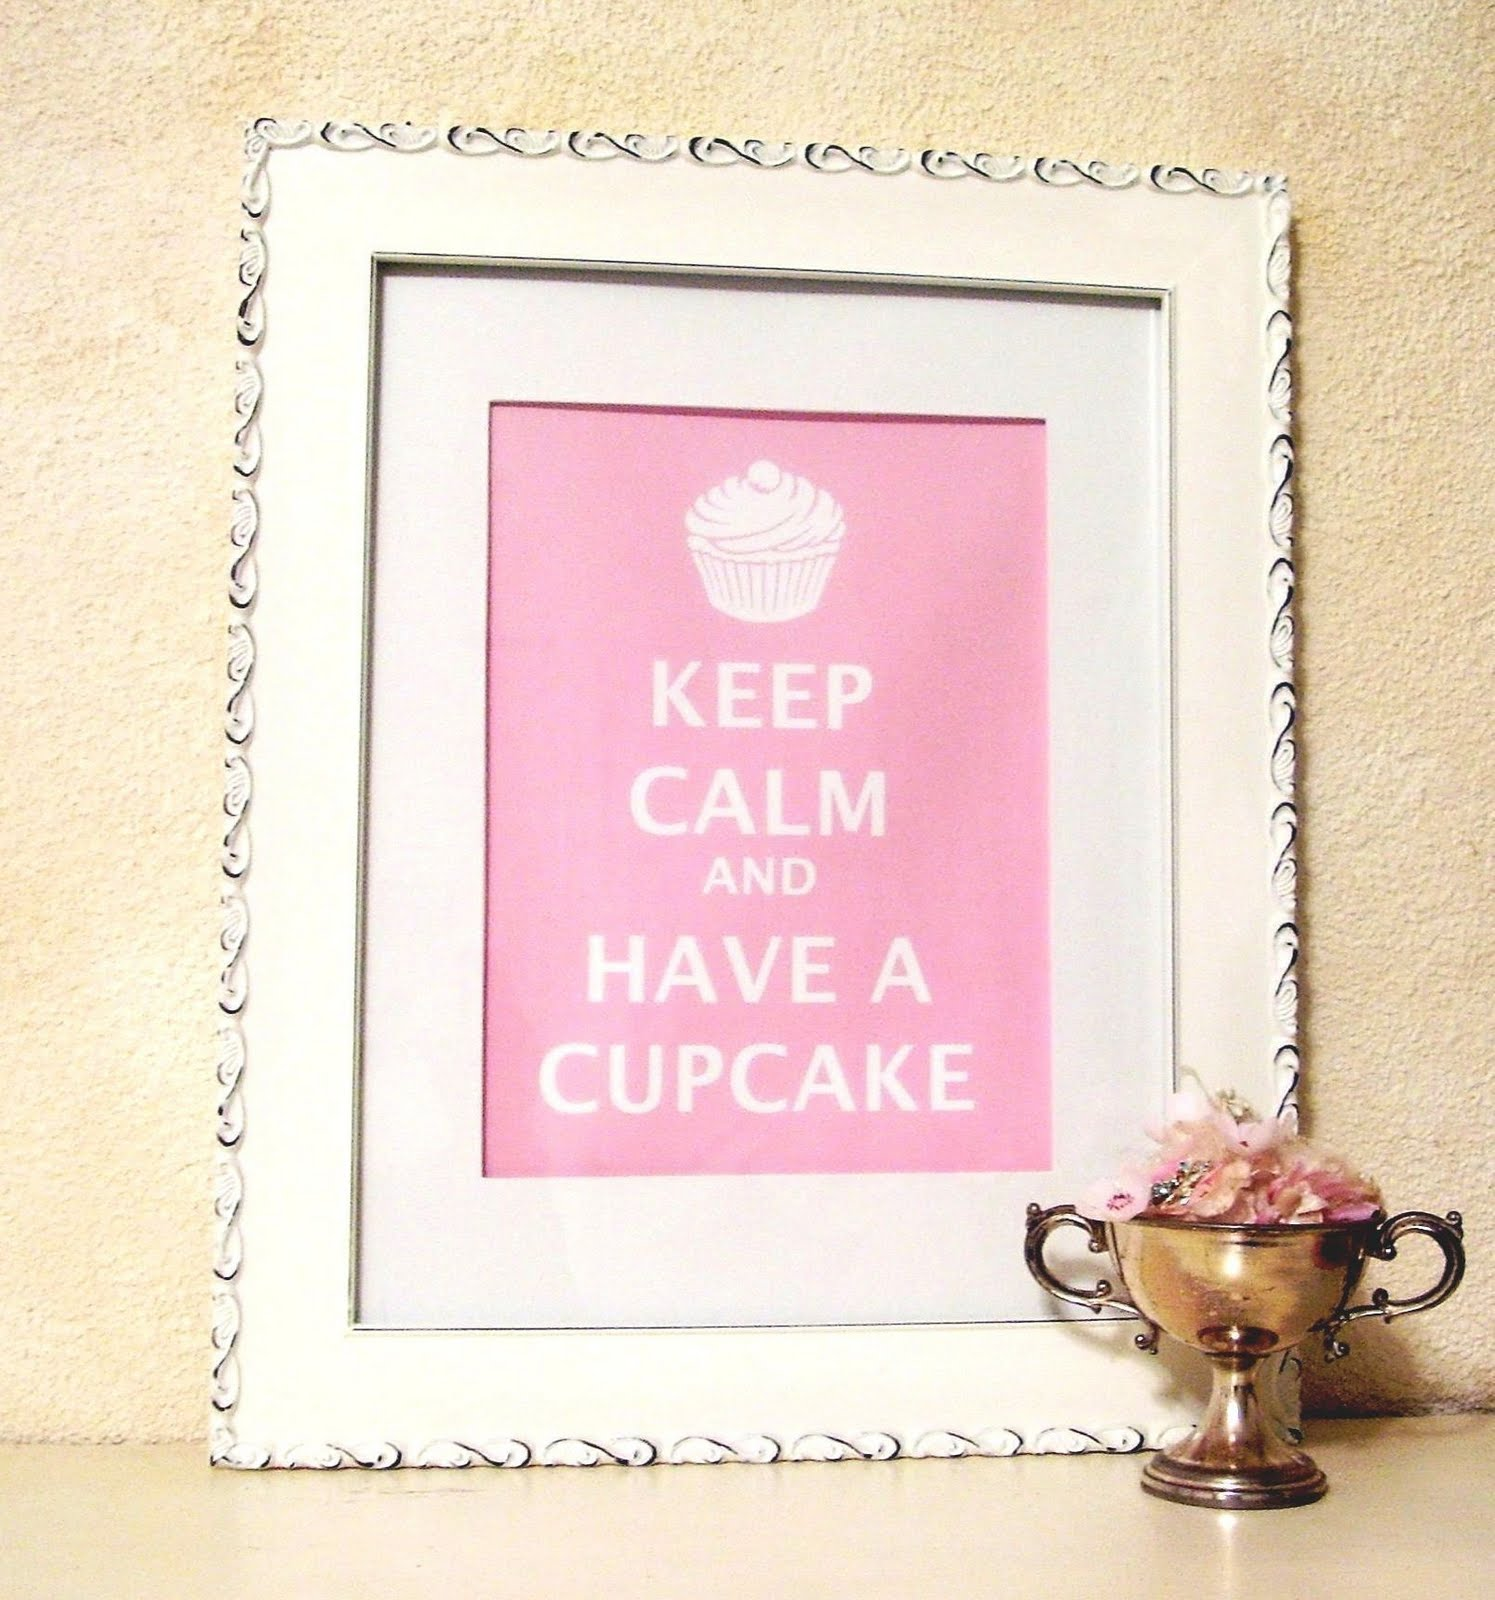 [Keep-Calm-and-Have-a-cupcake]